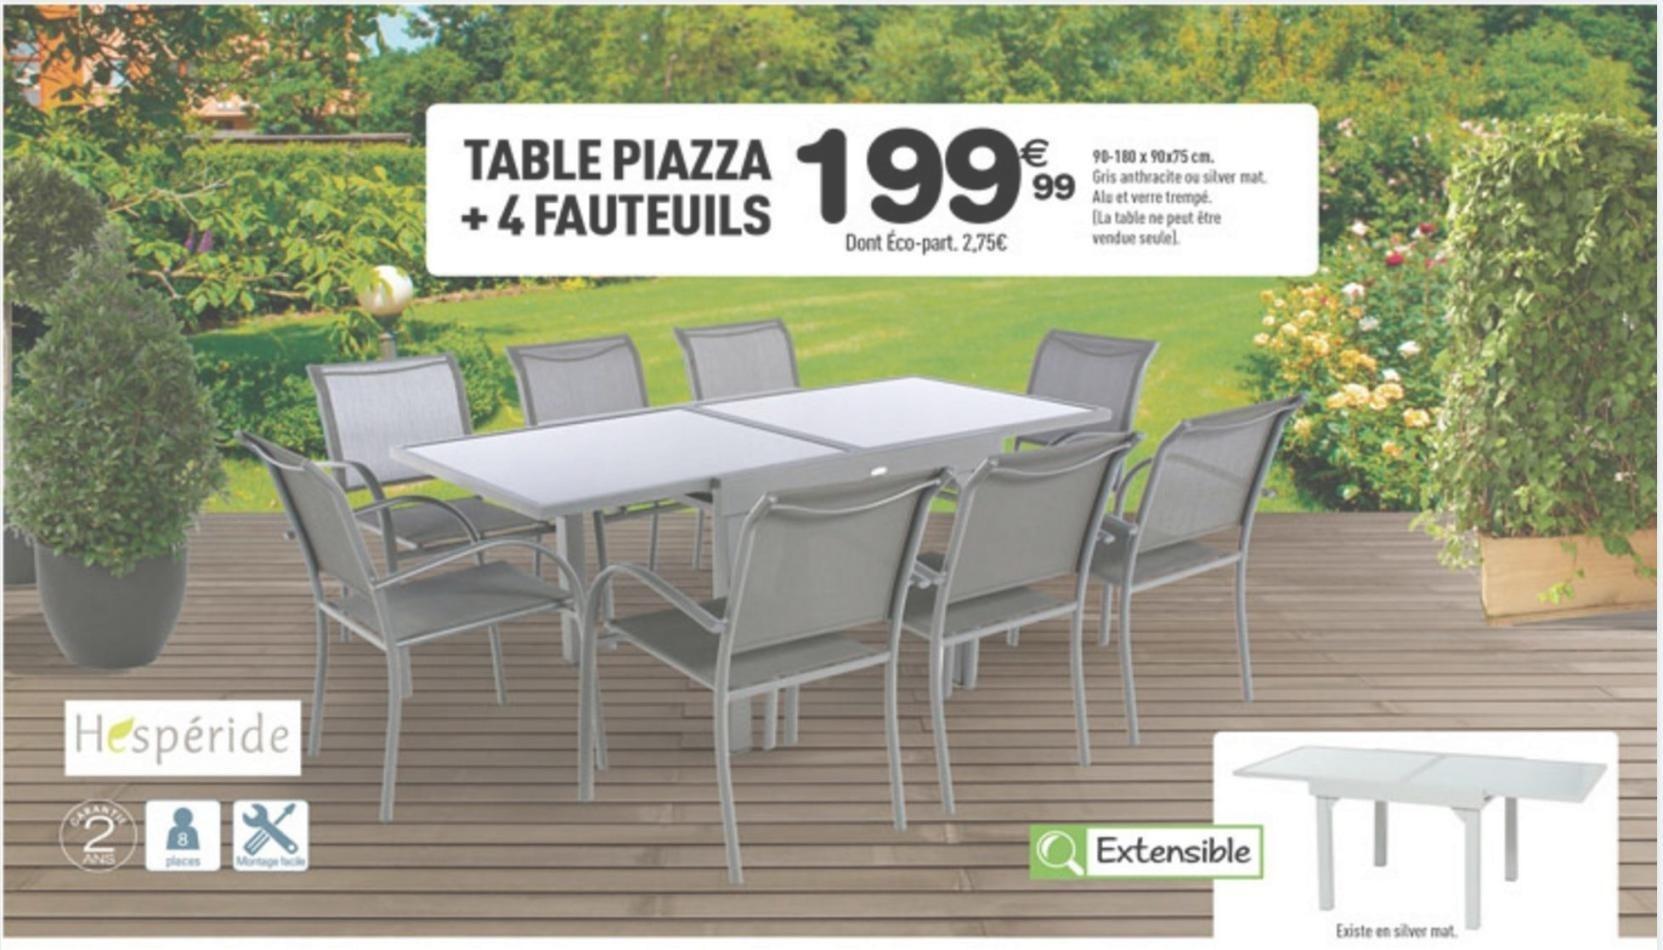 Table Centrakor Table De Table Centrakor De Hesperide ... destiné Hesperides Mobilier Jardin